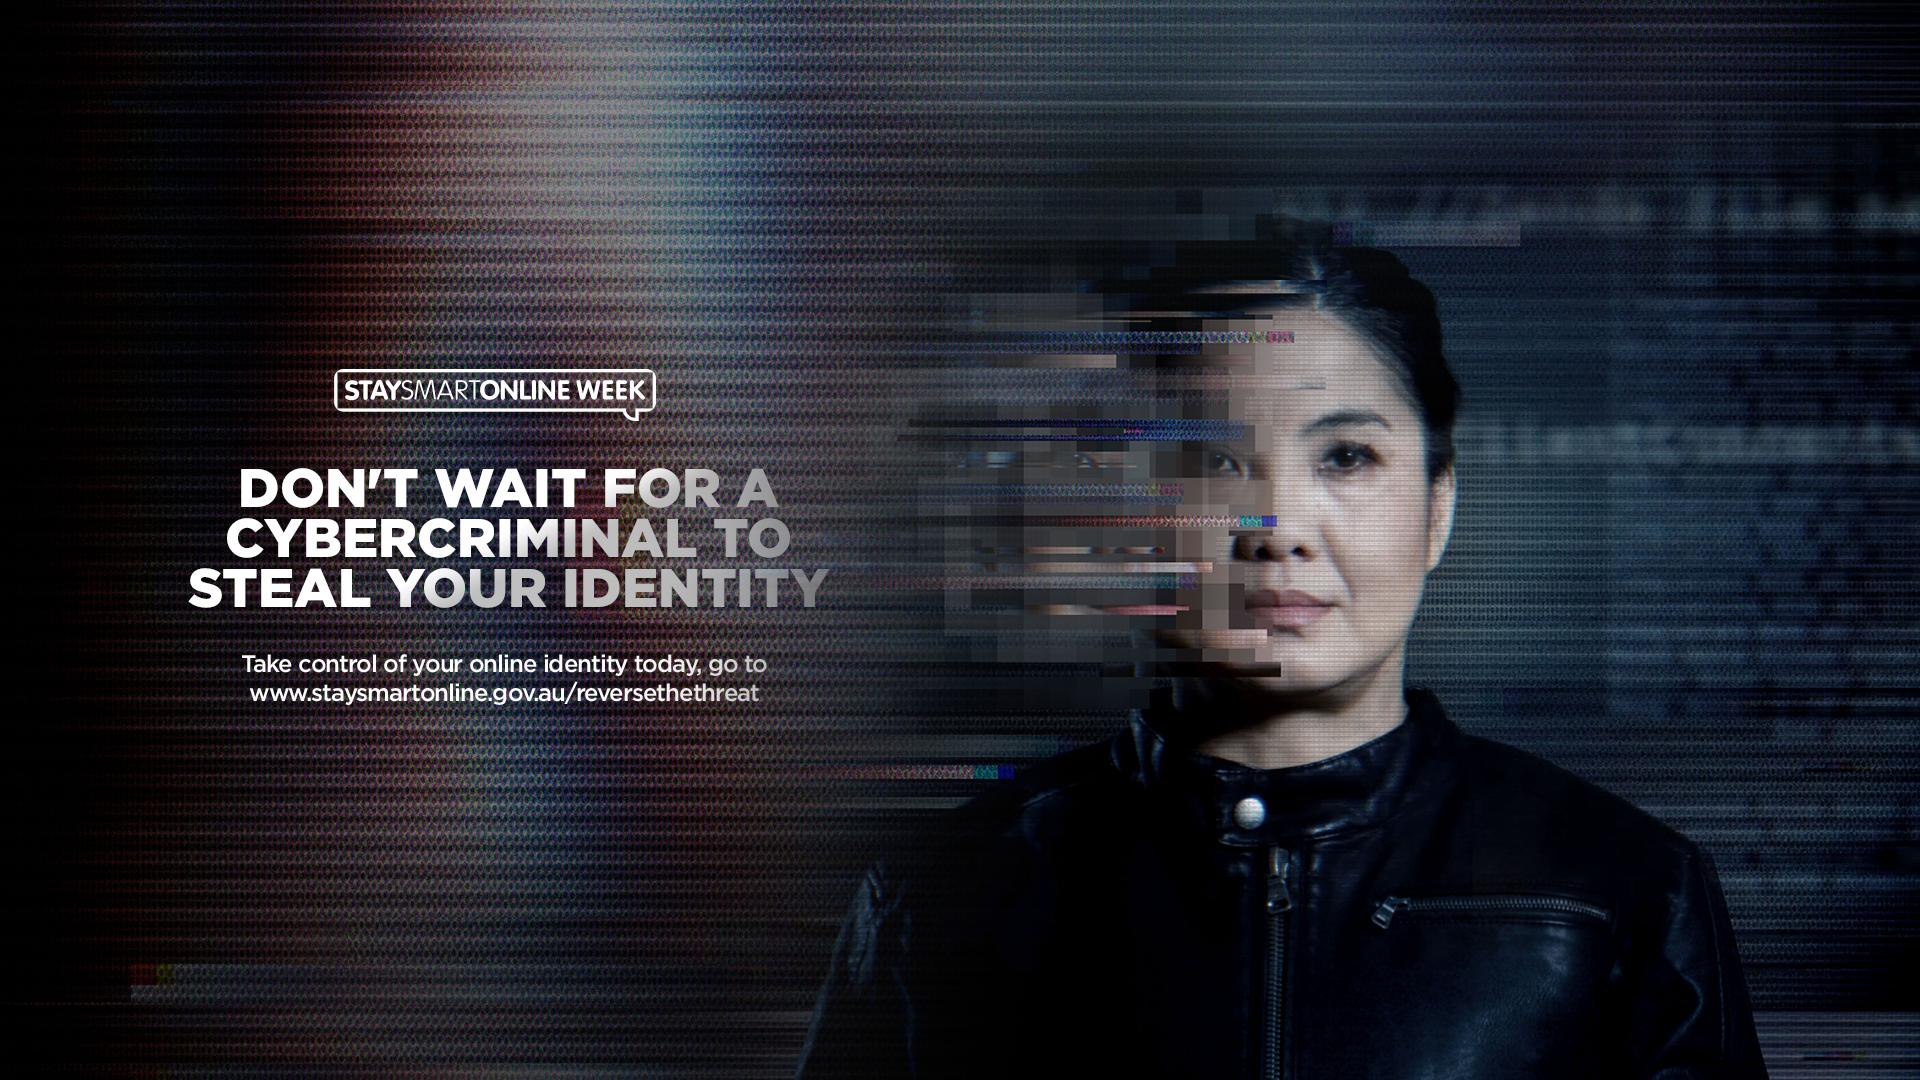 Australian Cyber Security Centre launches new campaign via The Shannon Company